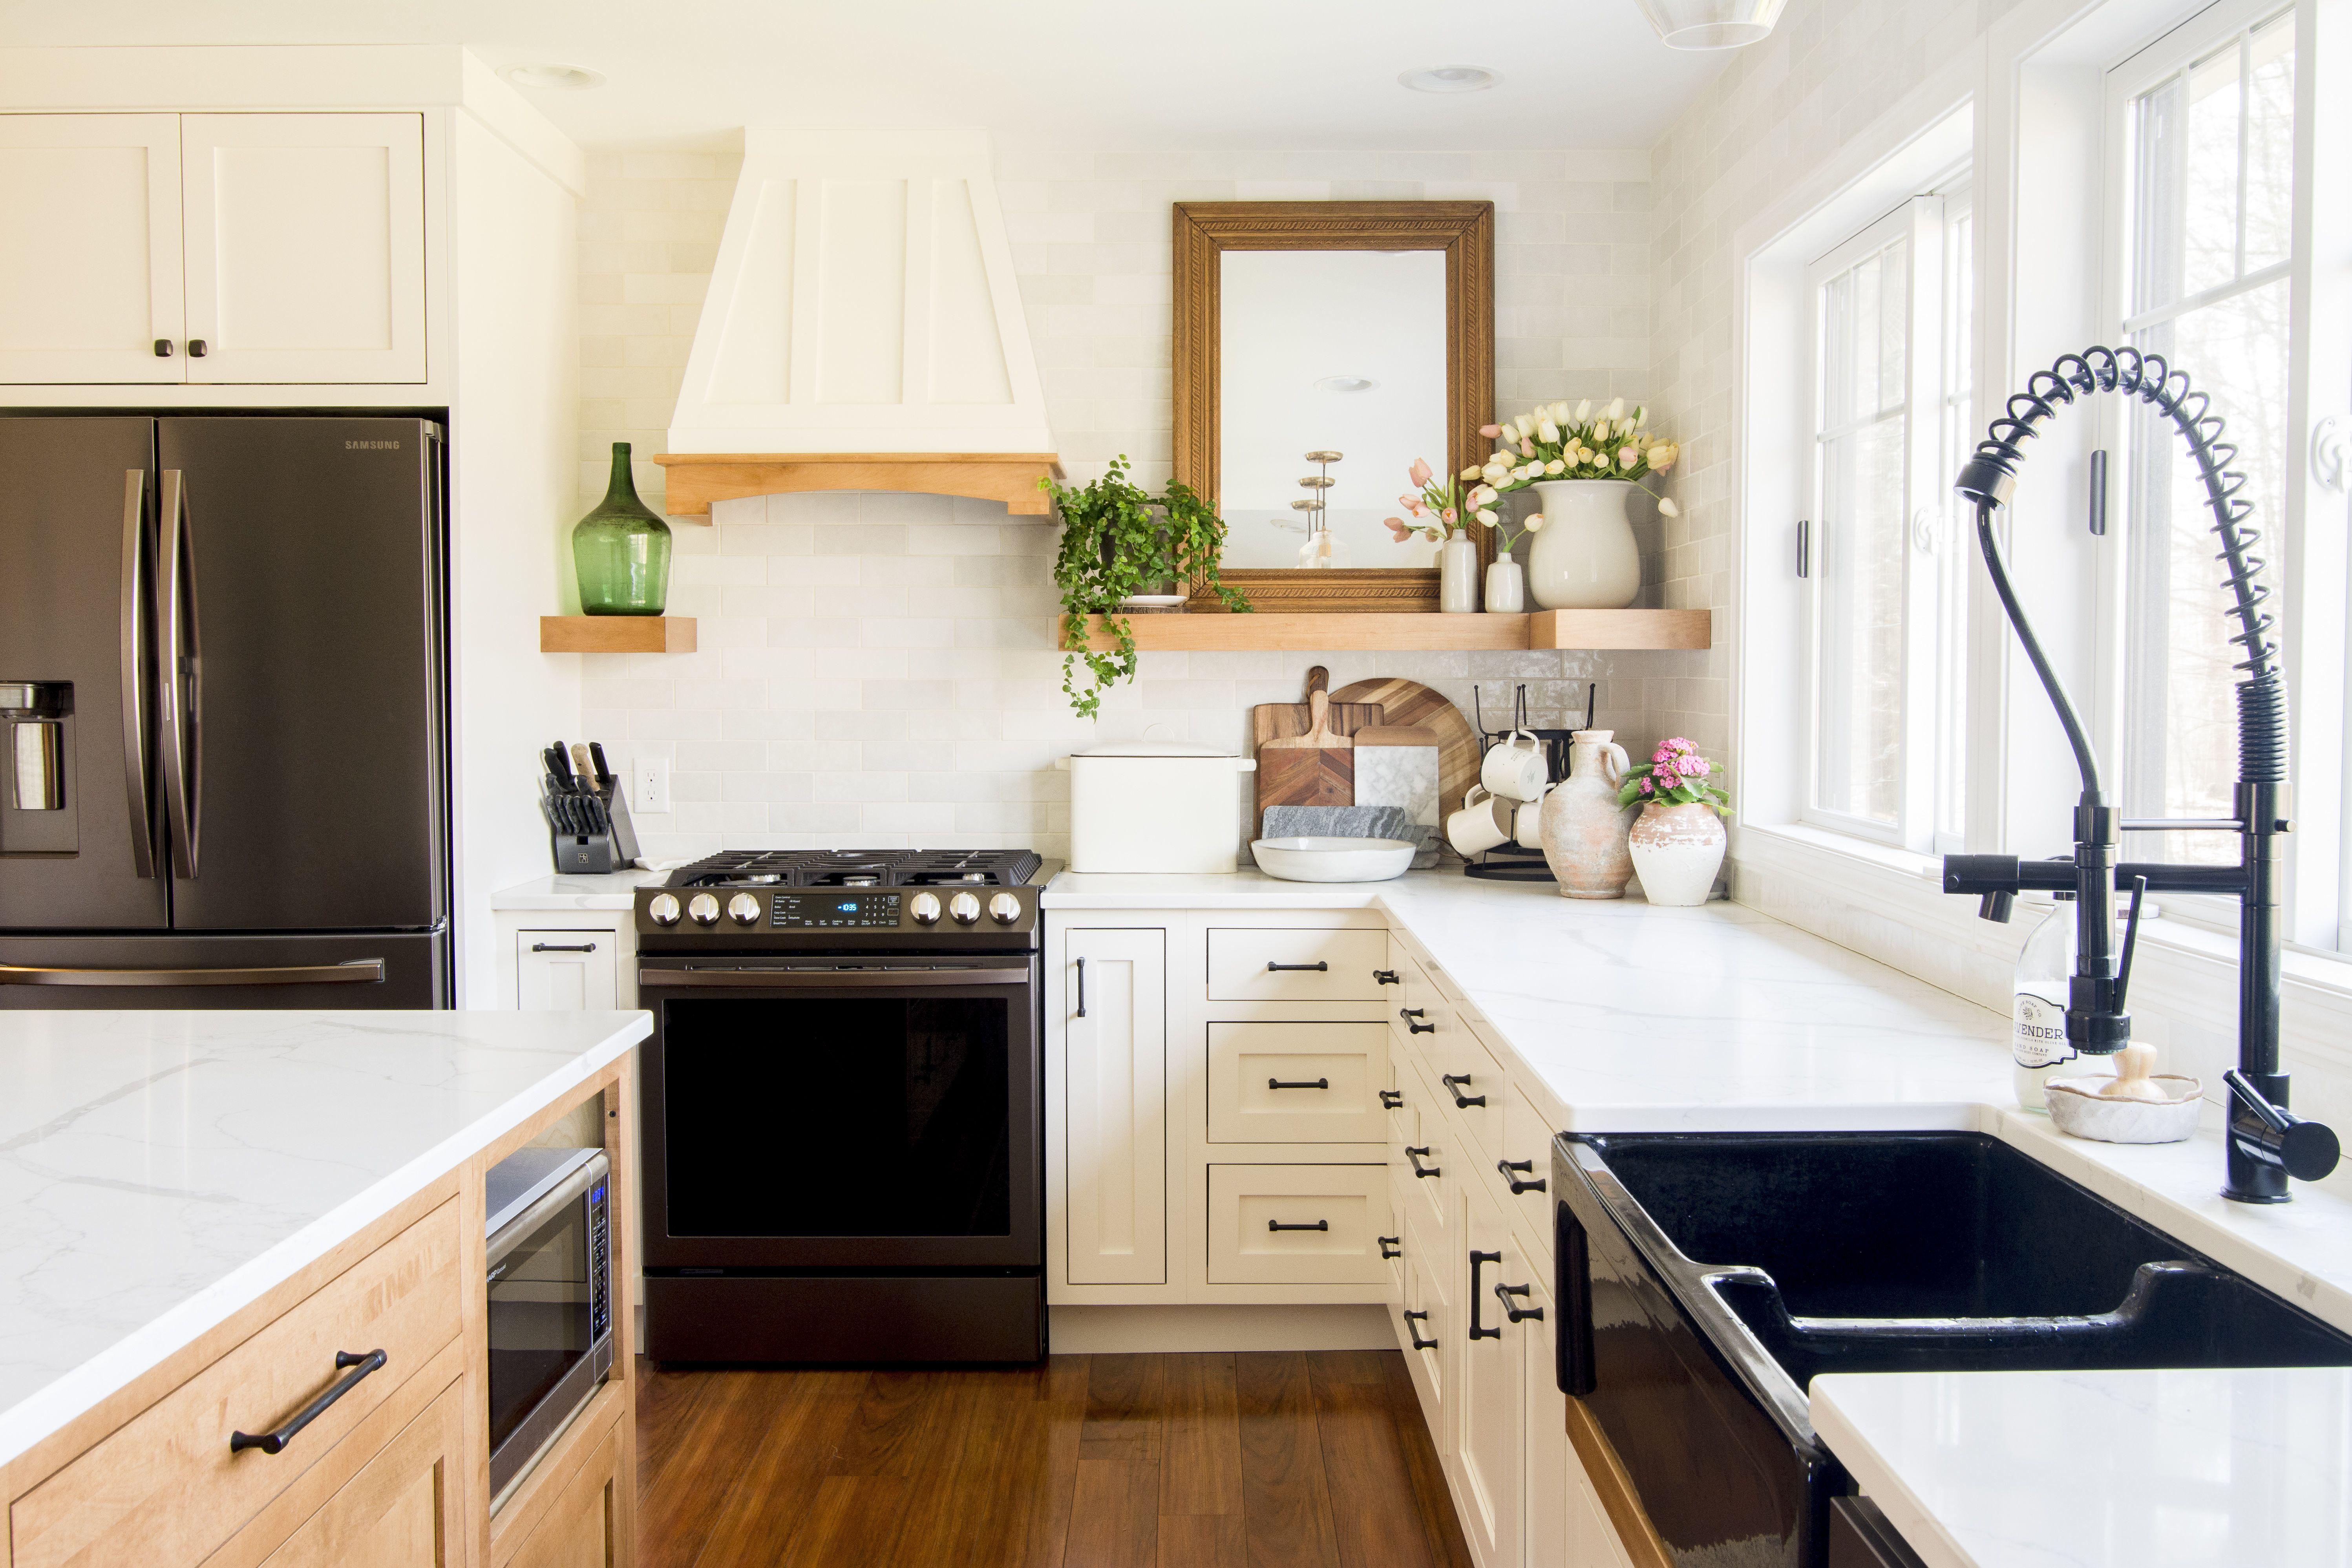 Kitchen With Matte Black Hardware And White Cabinets In 2020 Major Kitchen Appliances Kitchen White Kitchen Cabinets